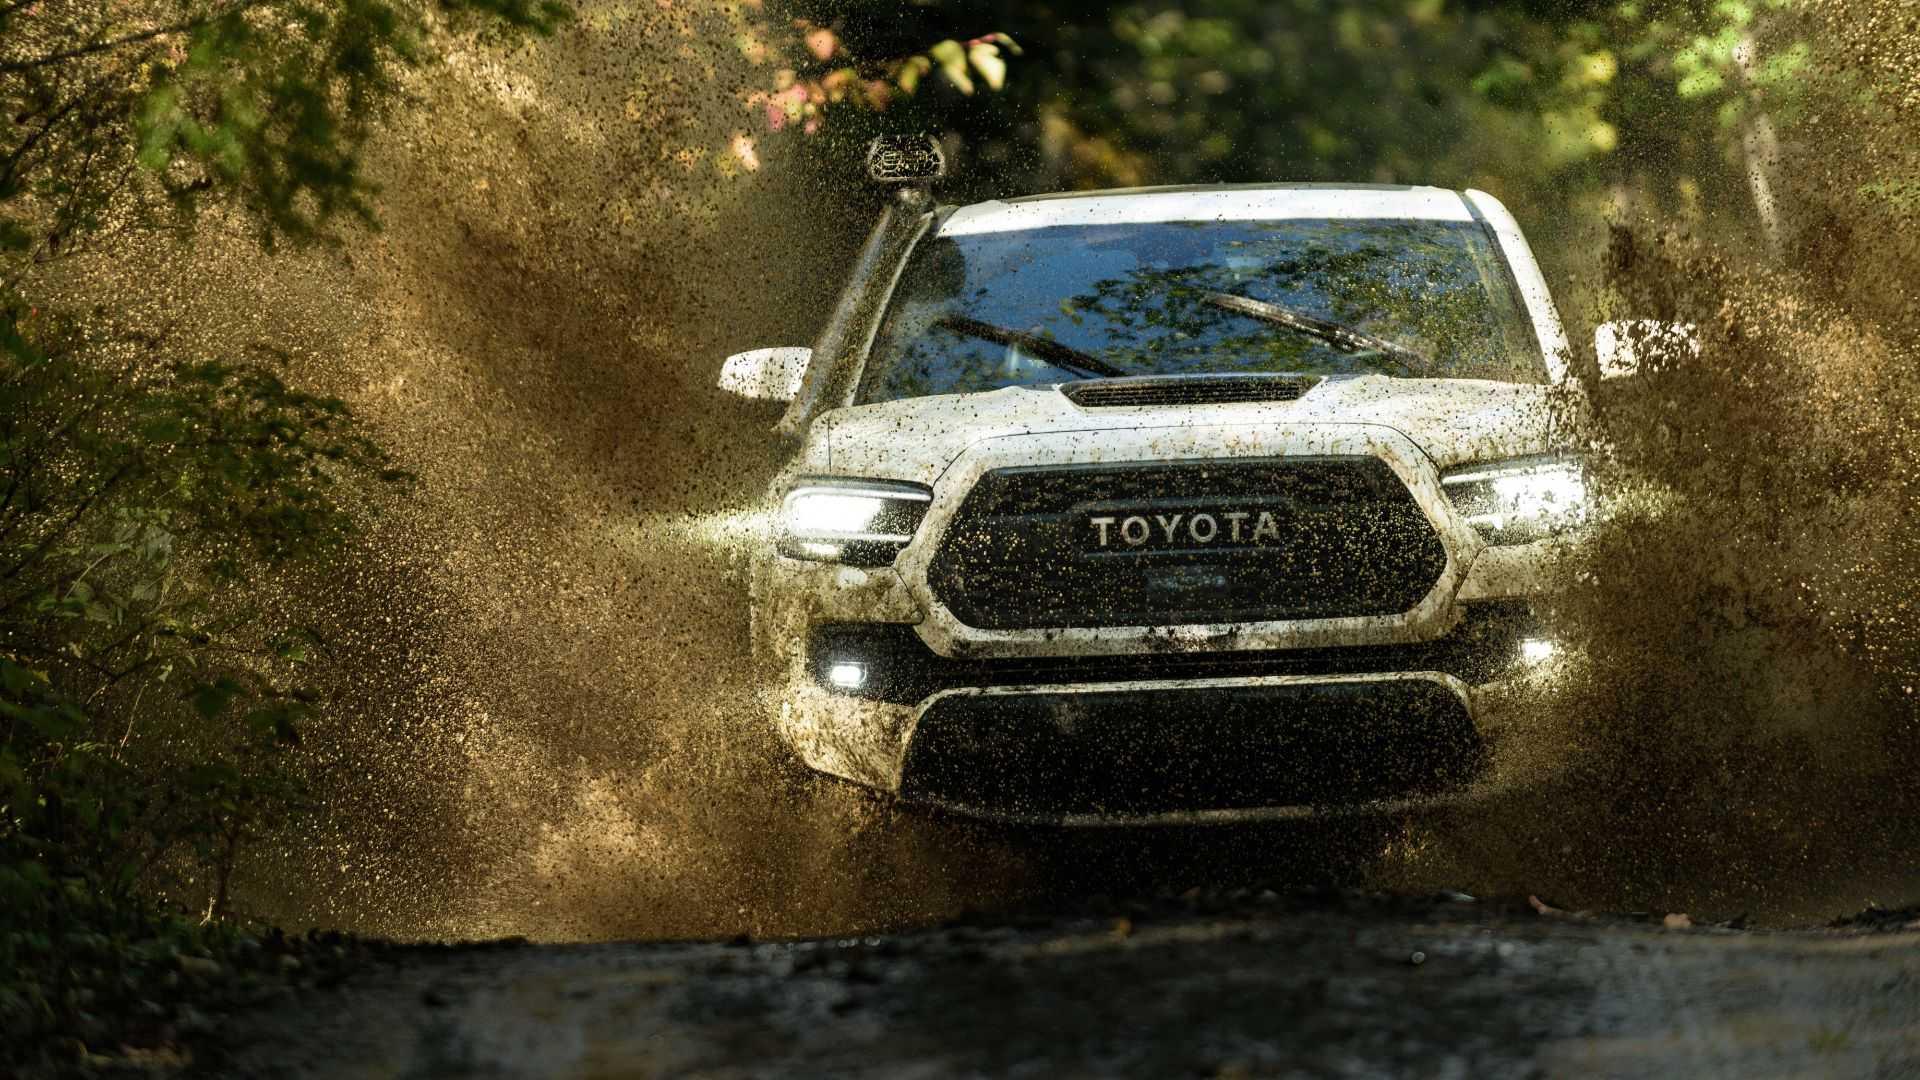 2020 Toyota Tacoma Revealed At Chicago Auto Show ...